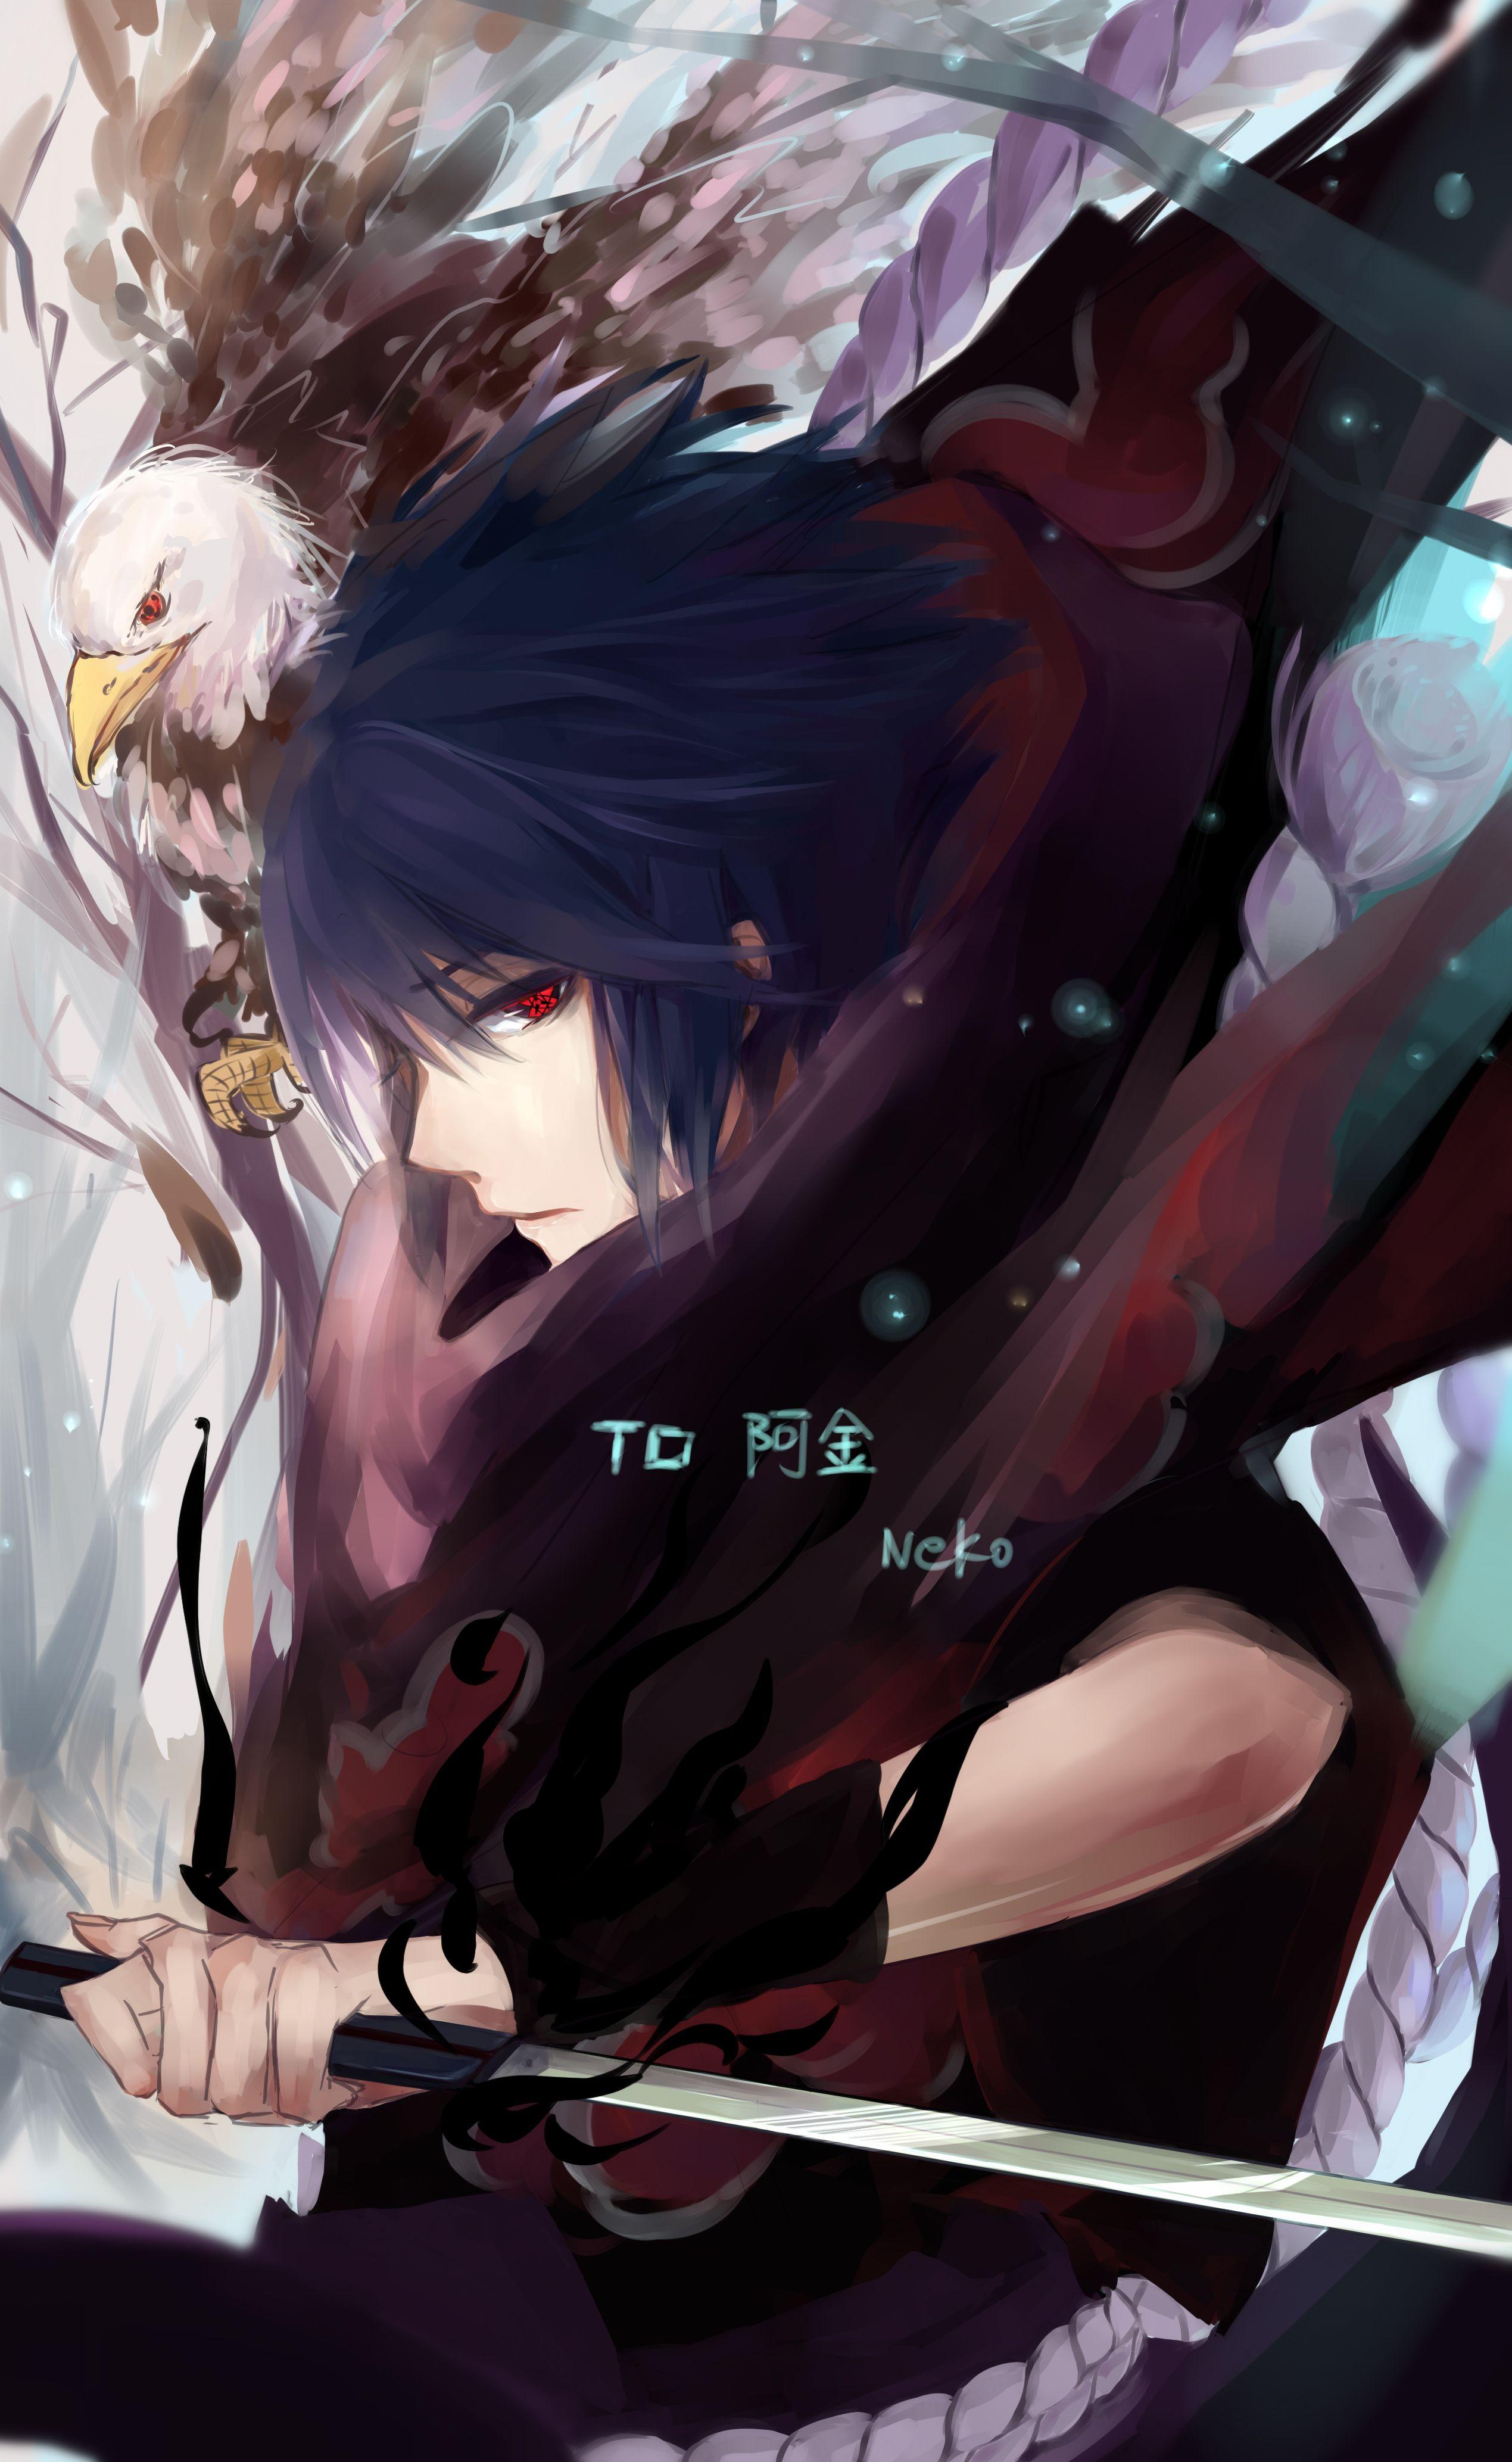 Uchiha Sasuke Sasuke is stupid but we love him